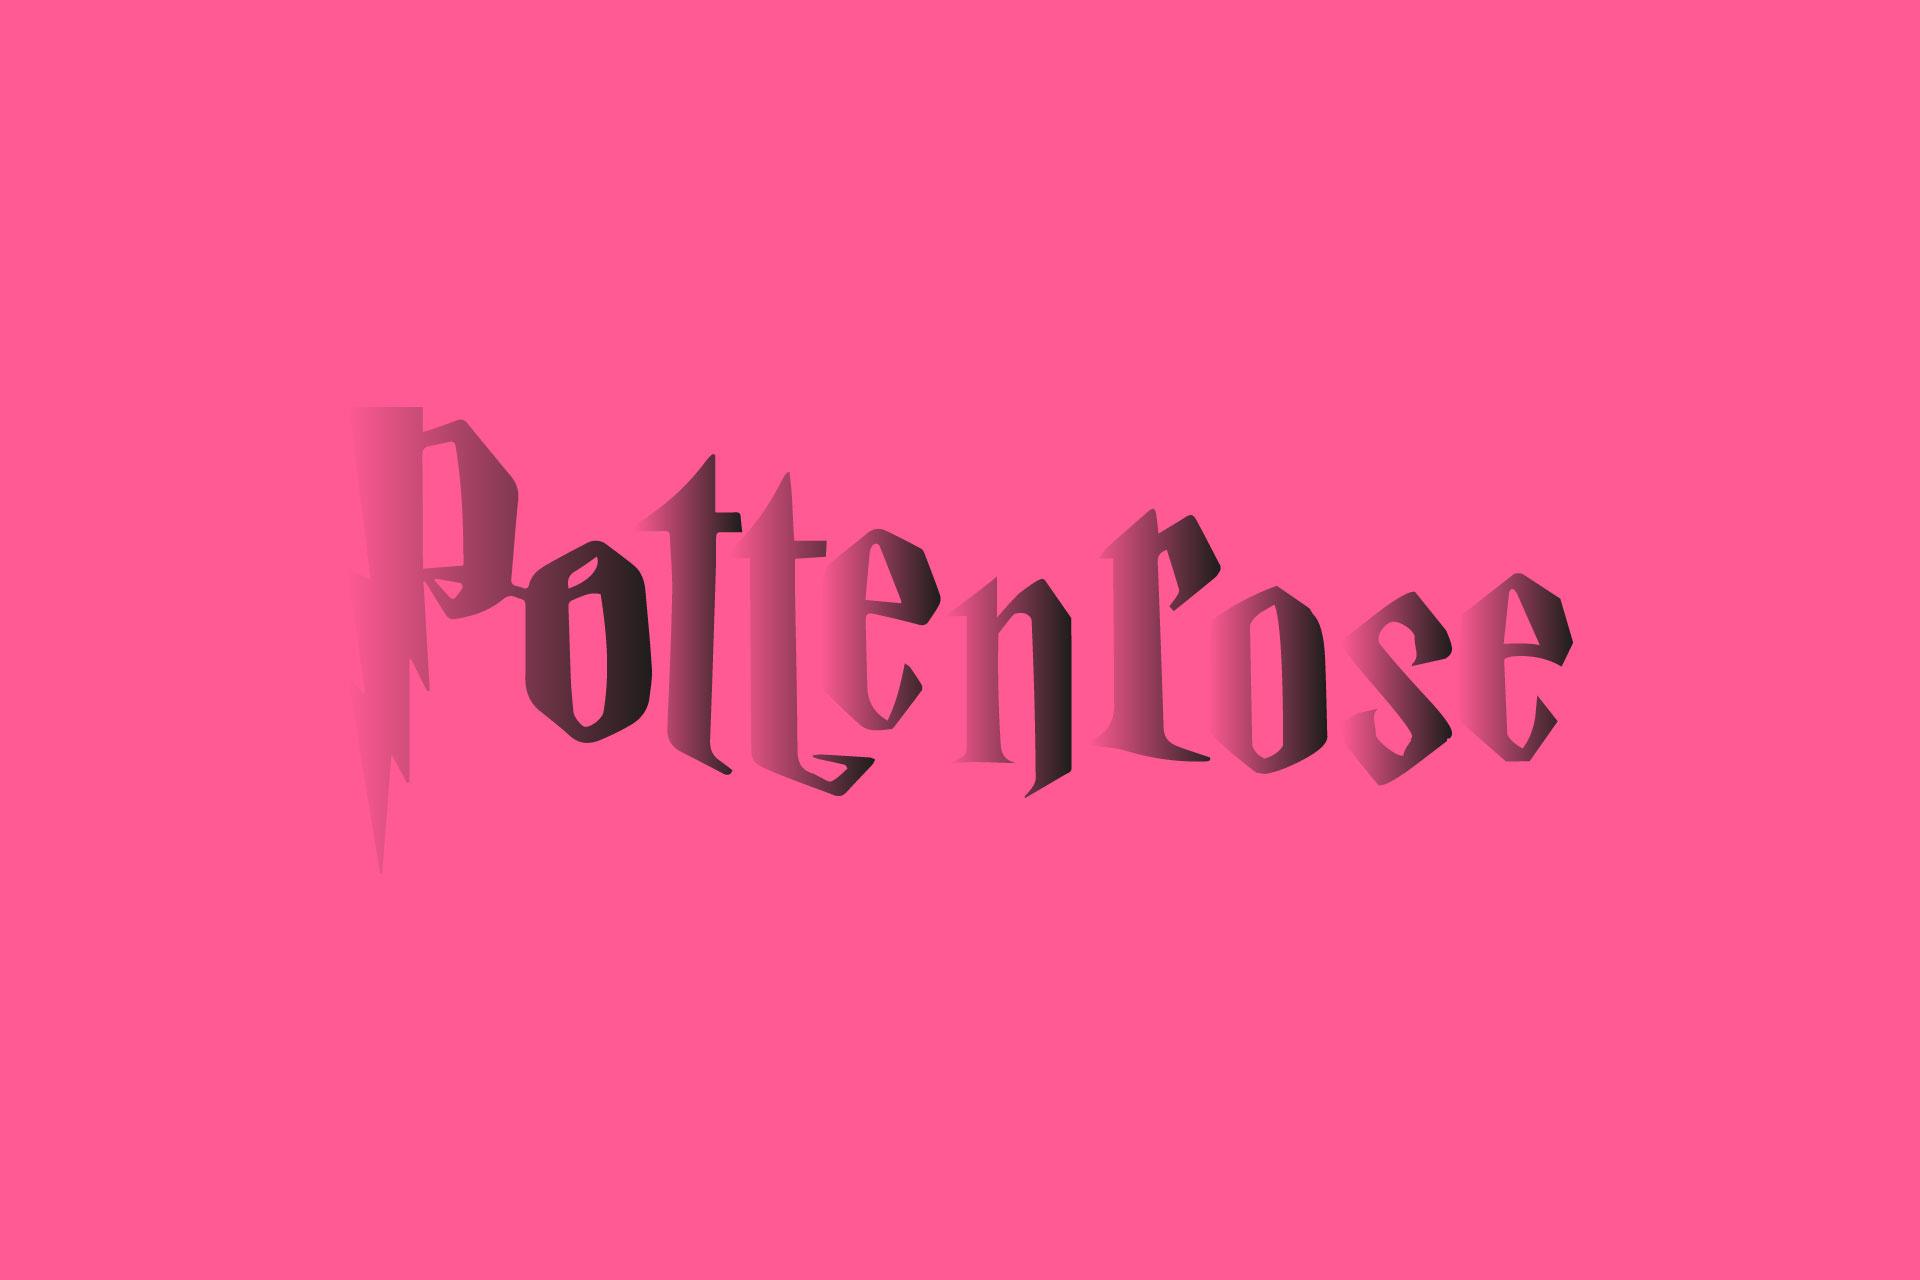 Pottenrose